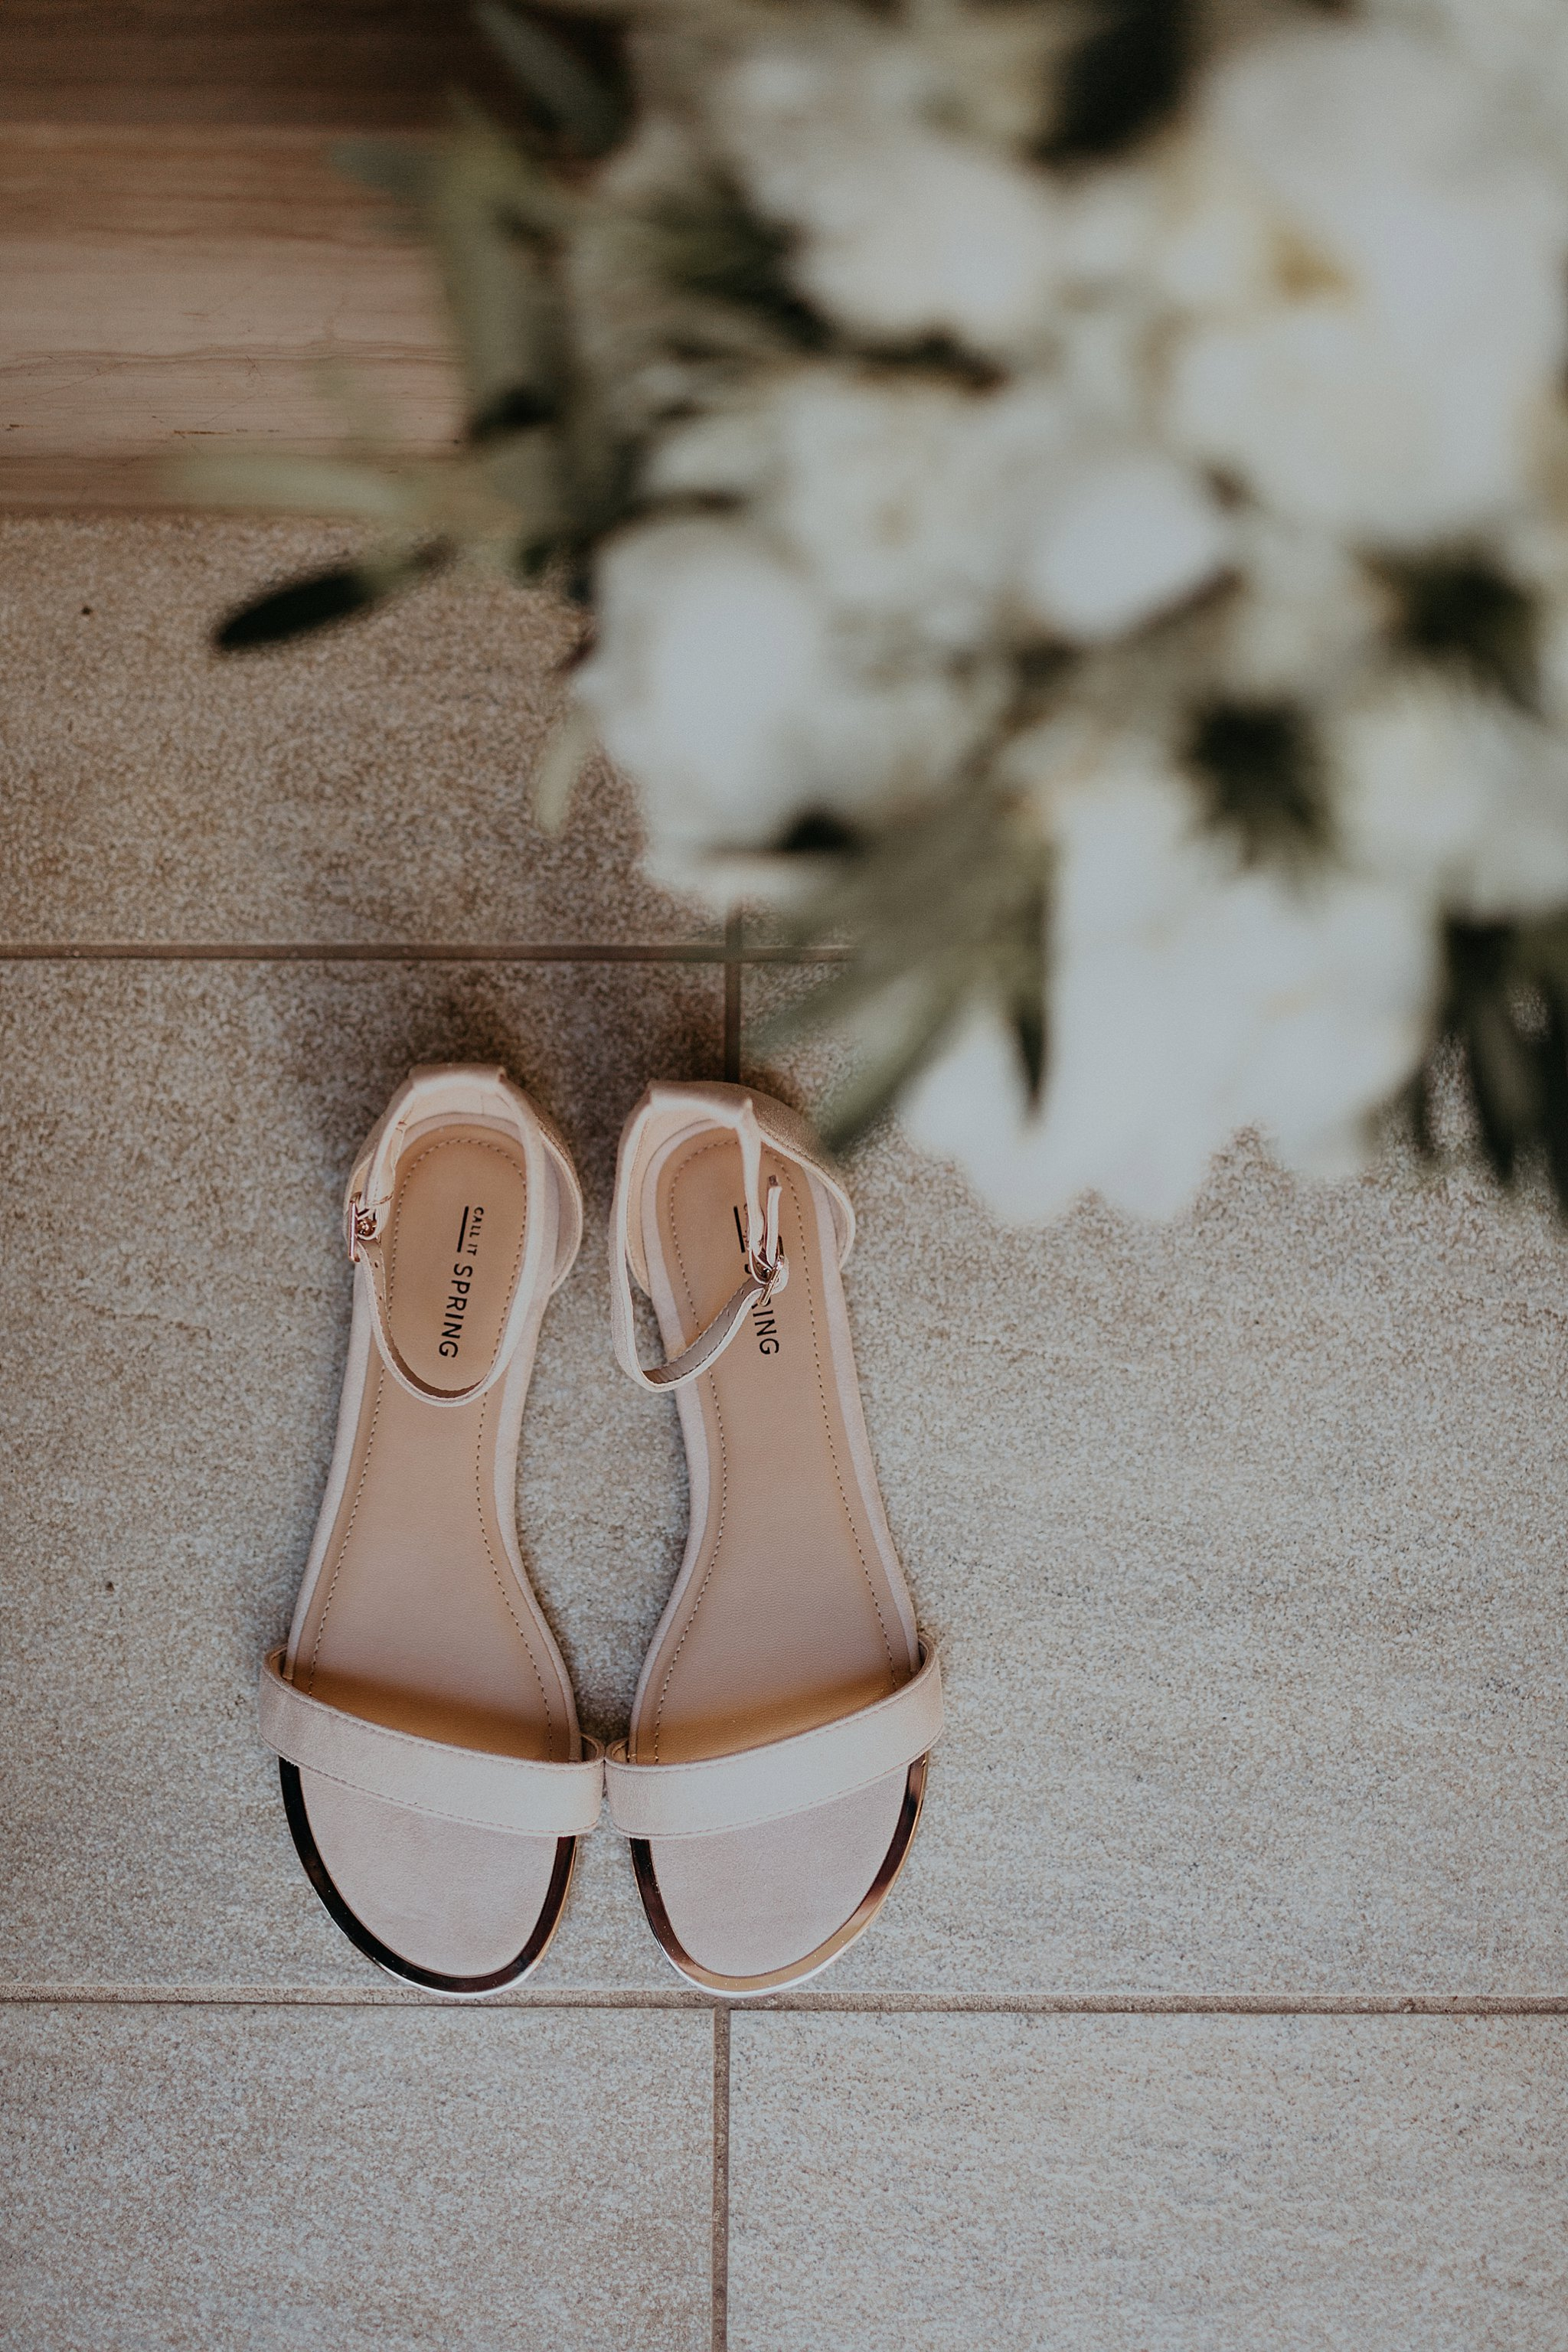 samantha_mcfarlen_bellingham_washington_engagement_photography_seattle_wedding_photographer_0270.jpg